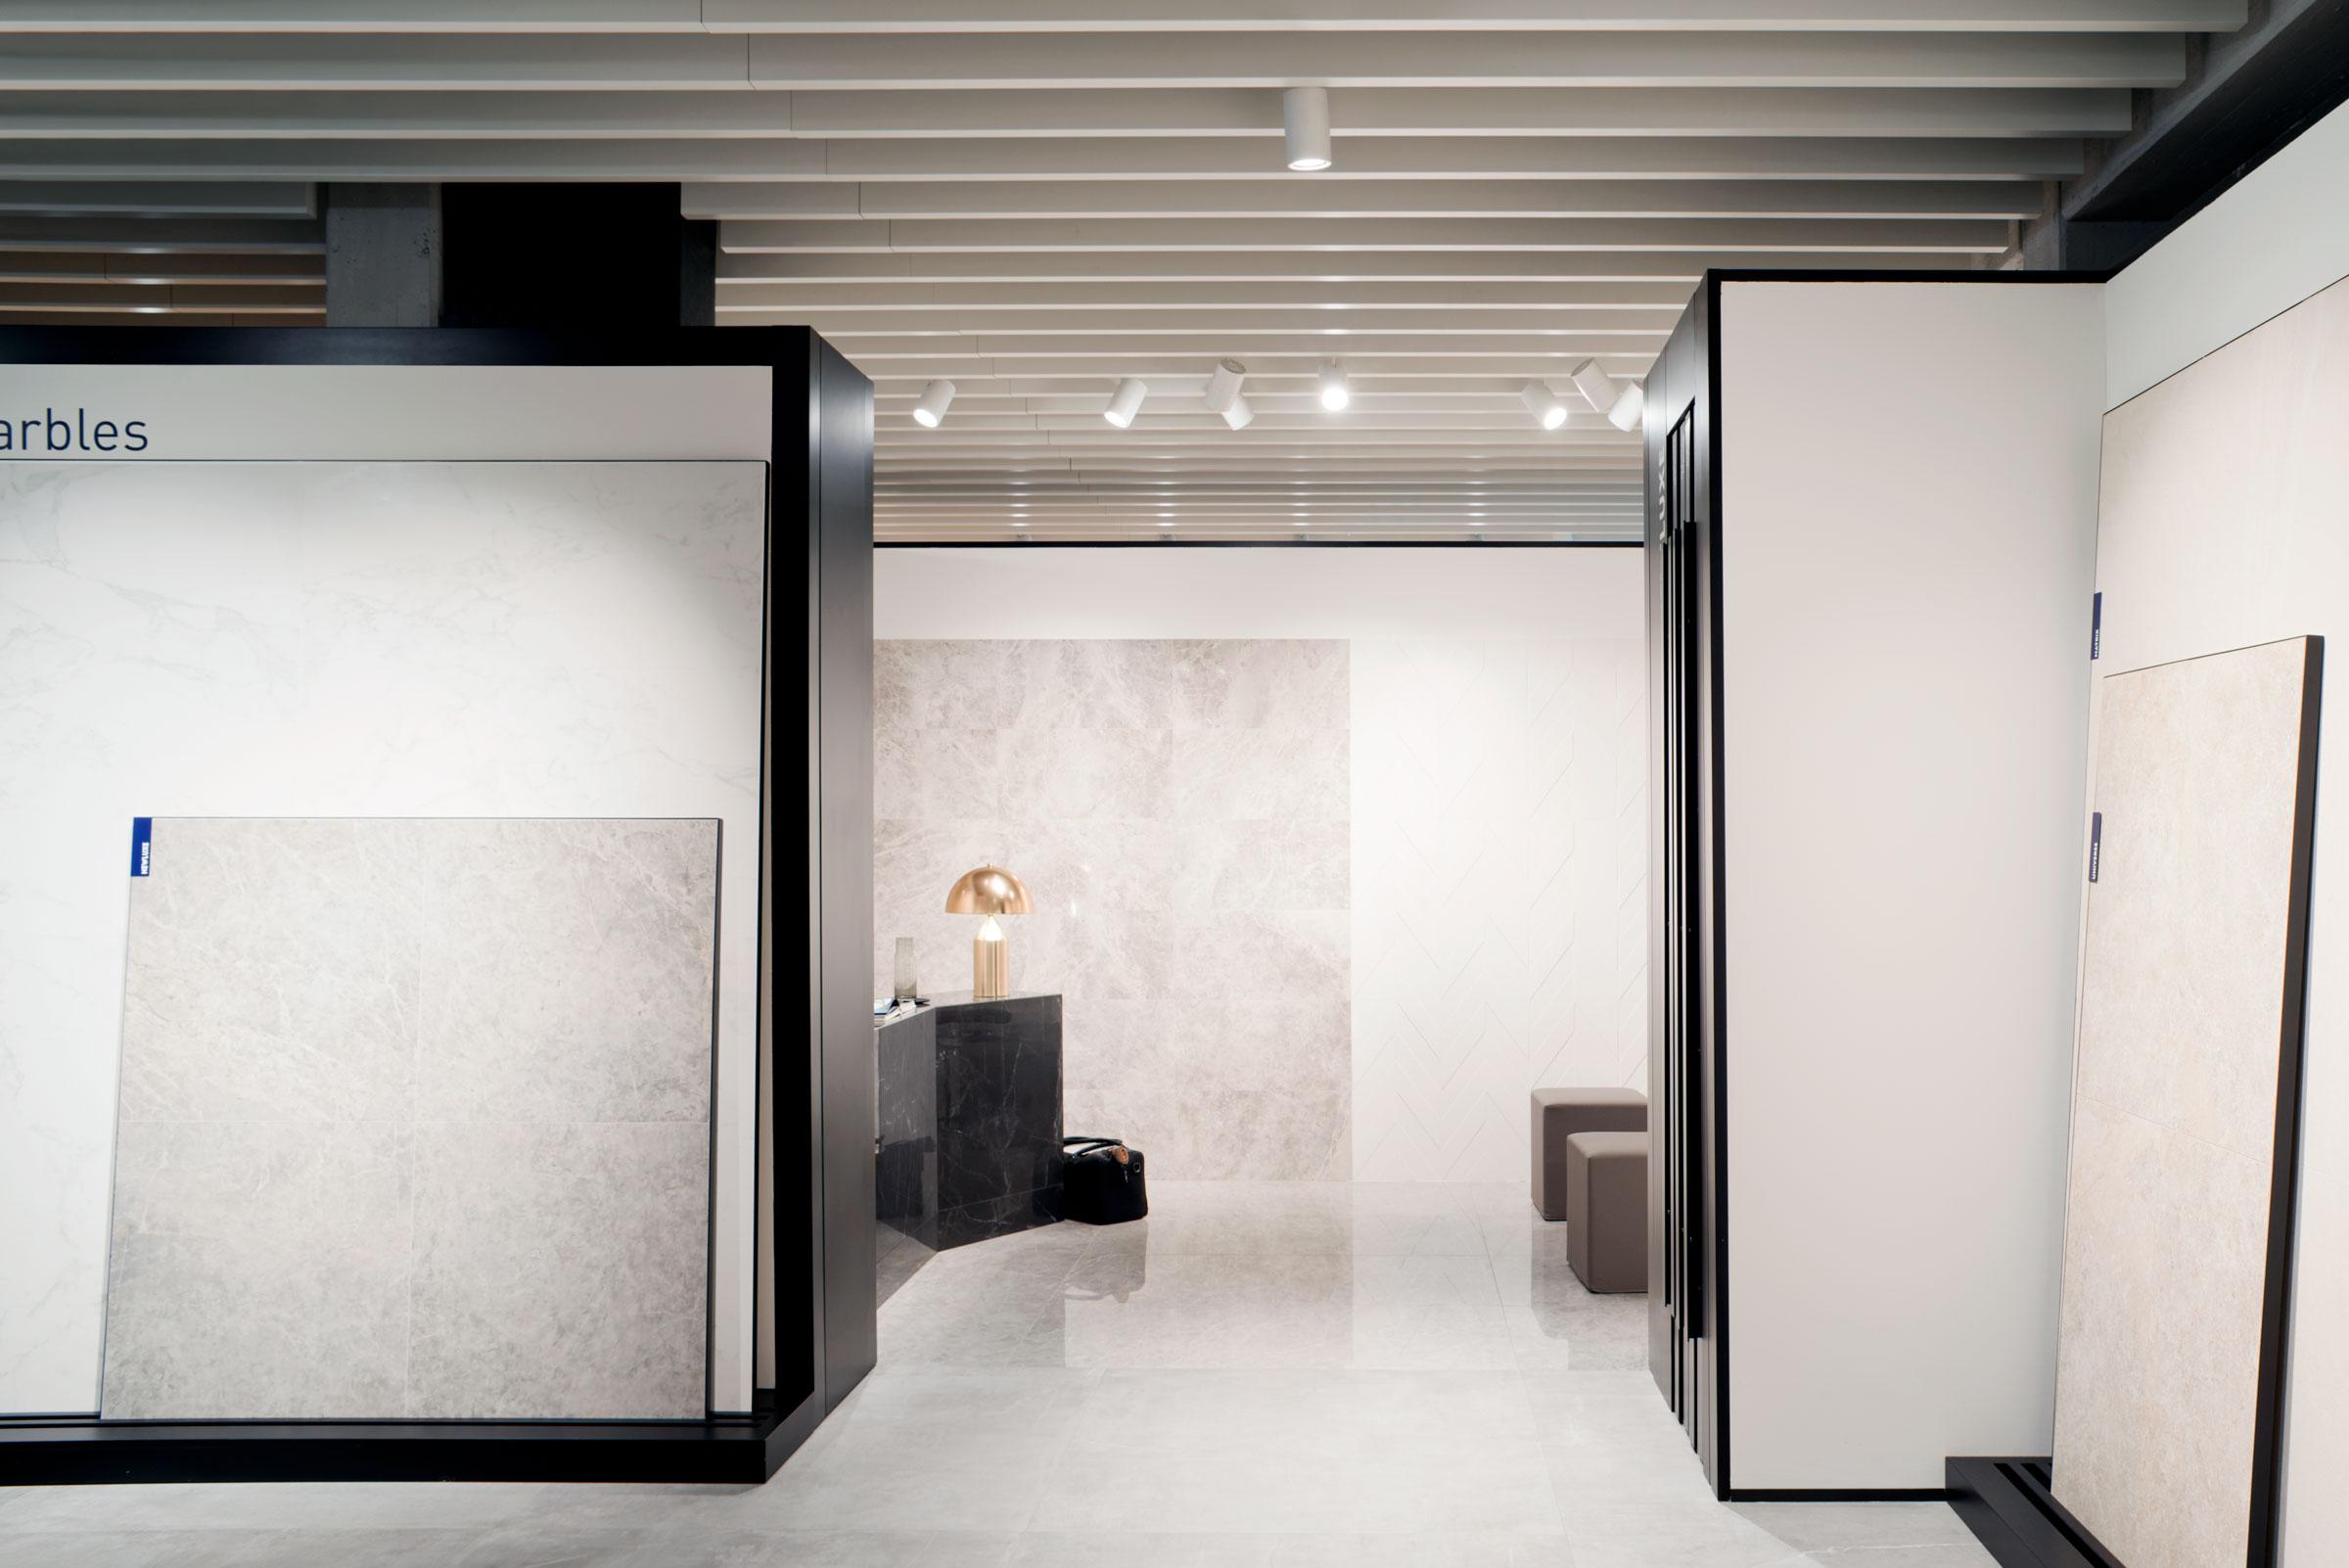 Marca Corona, showroom, sala mostra, interior design, sassuolo, firenze, deferrari modesti